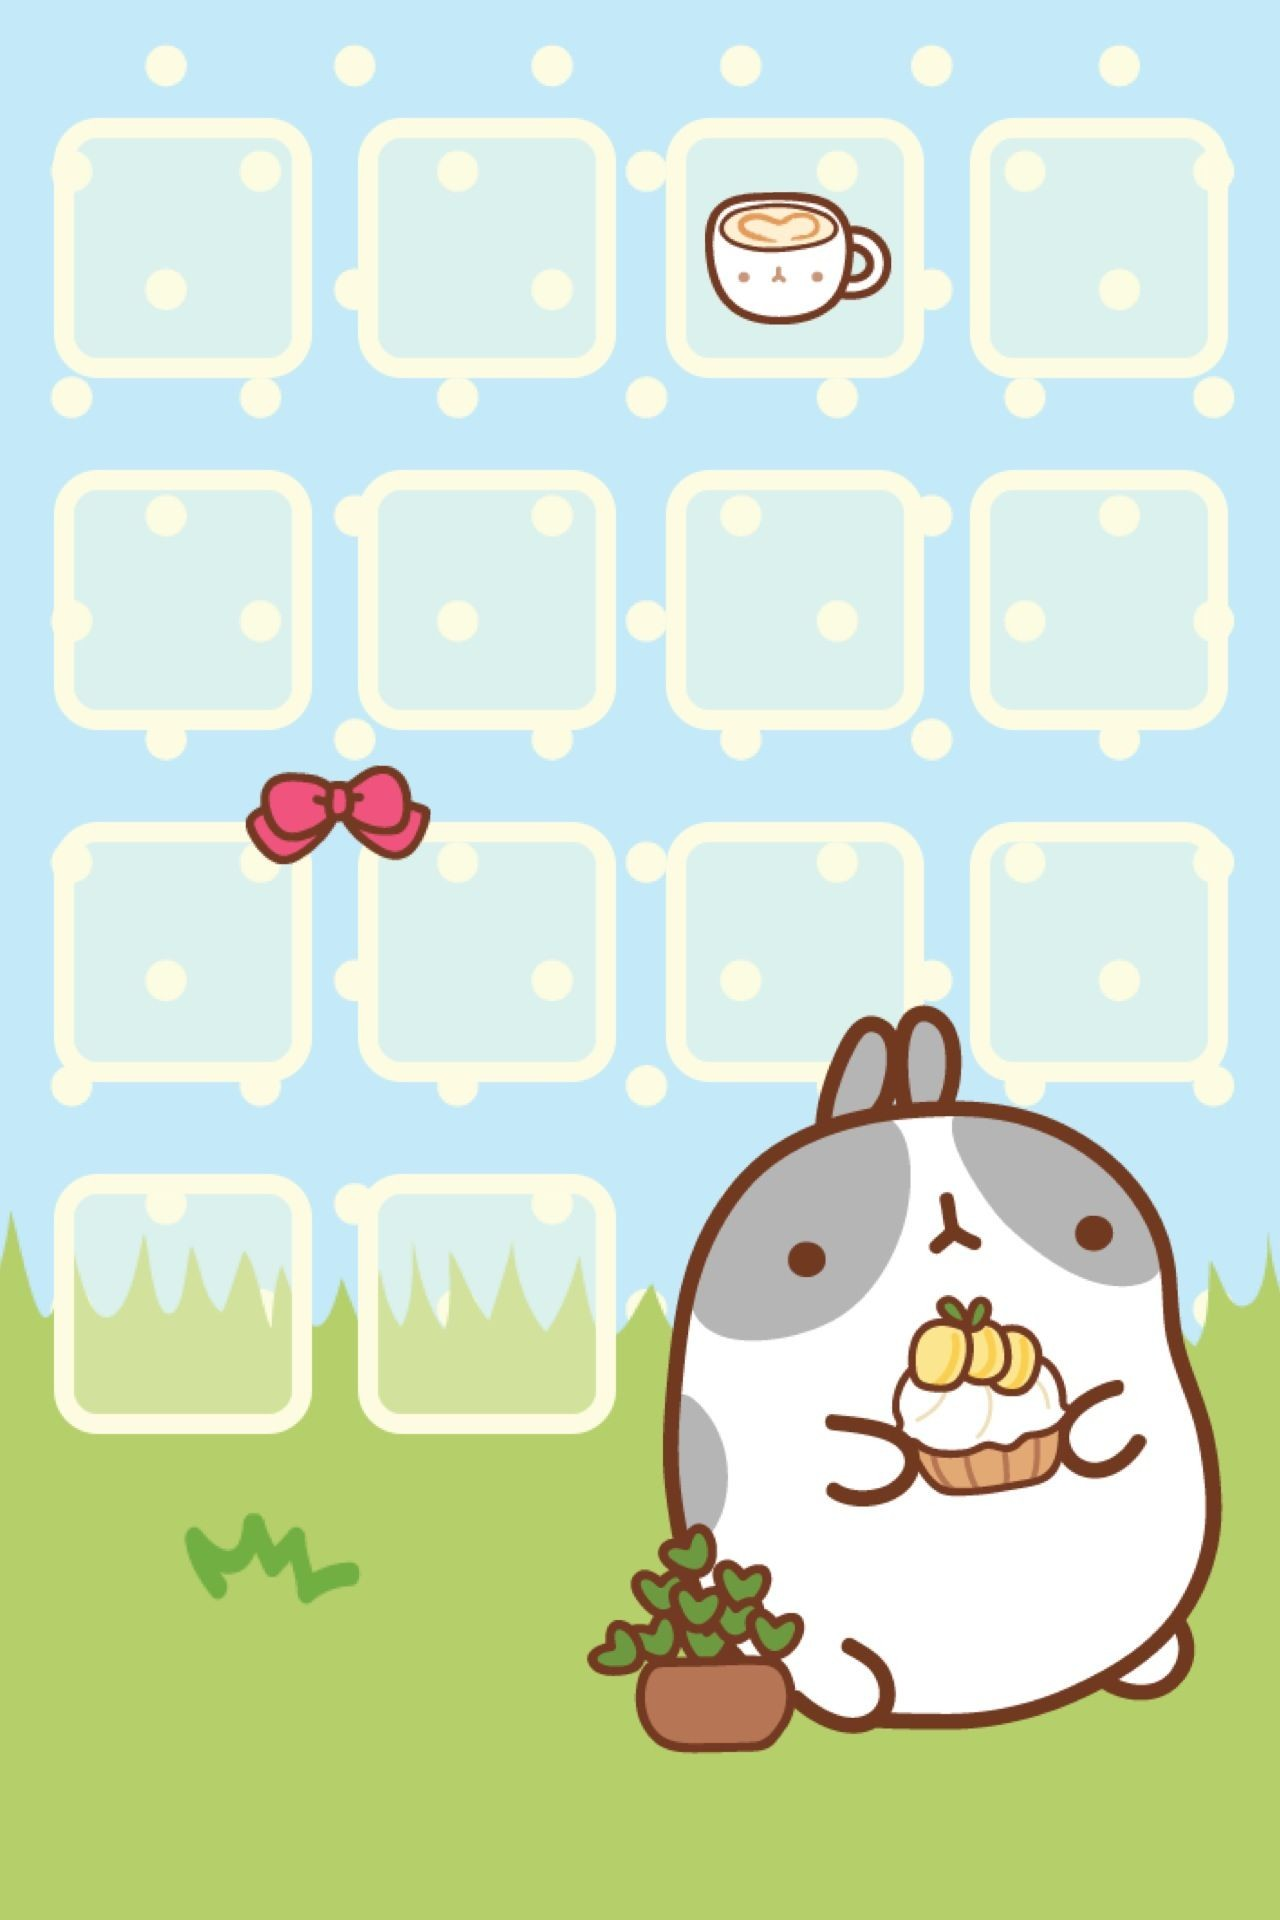 Iphone Wallpaper Tumblr ~ buana – Wallpaper Zone